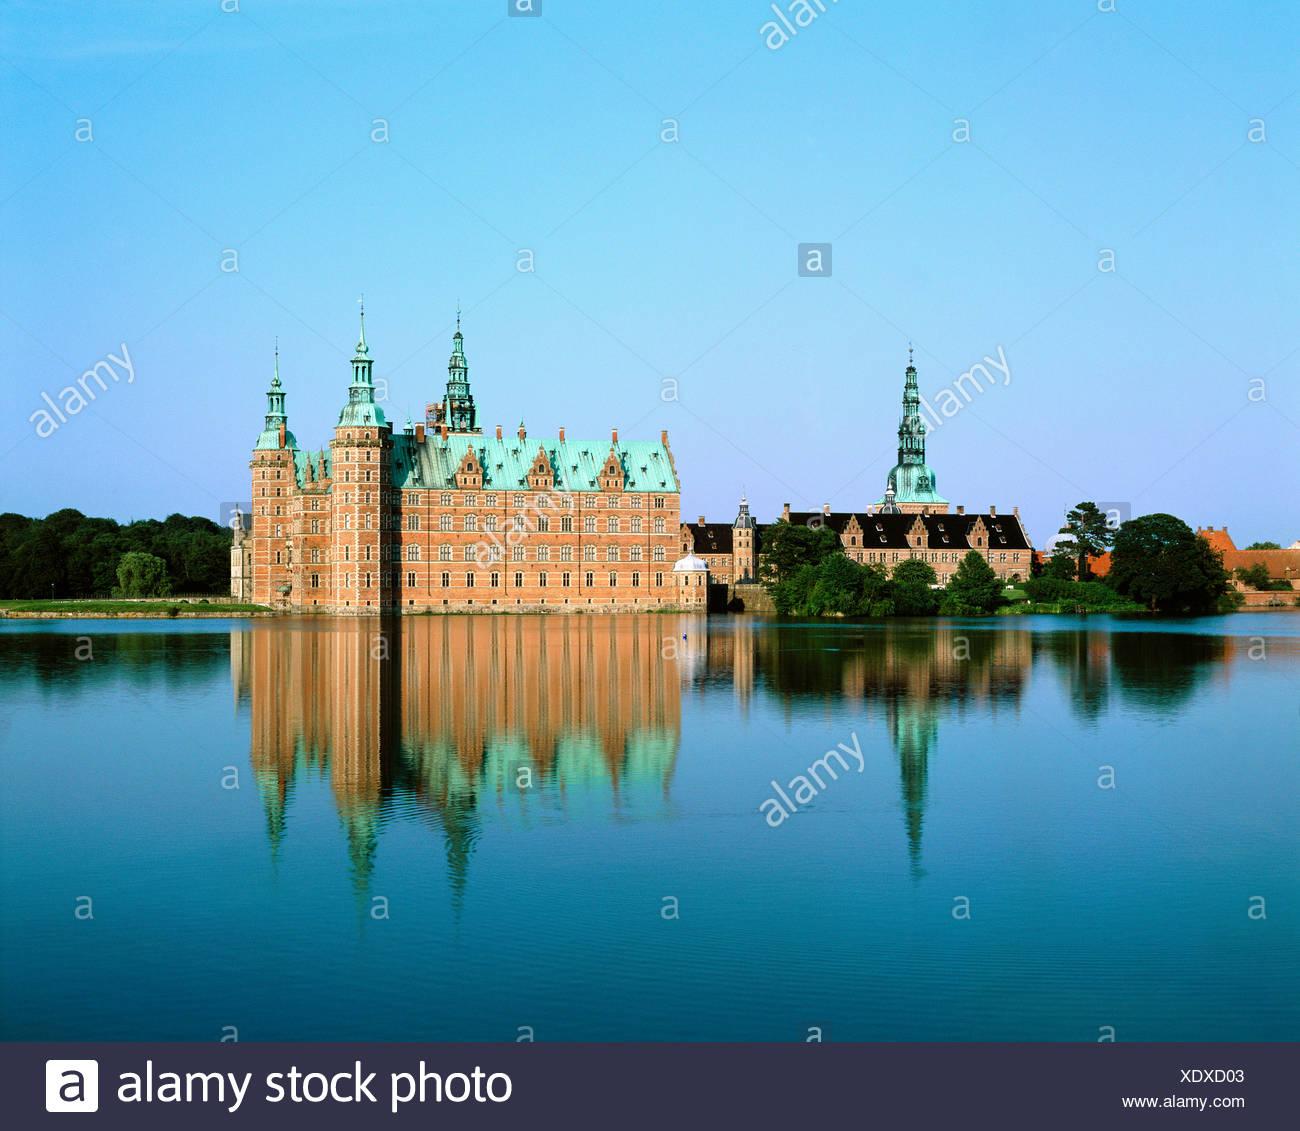 Dänemark Europa Hillerod Renaissance Schloss Schloss Frederiksborg Wasserburg Stockbild